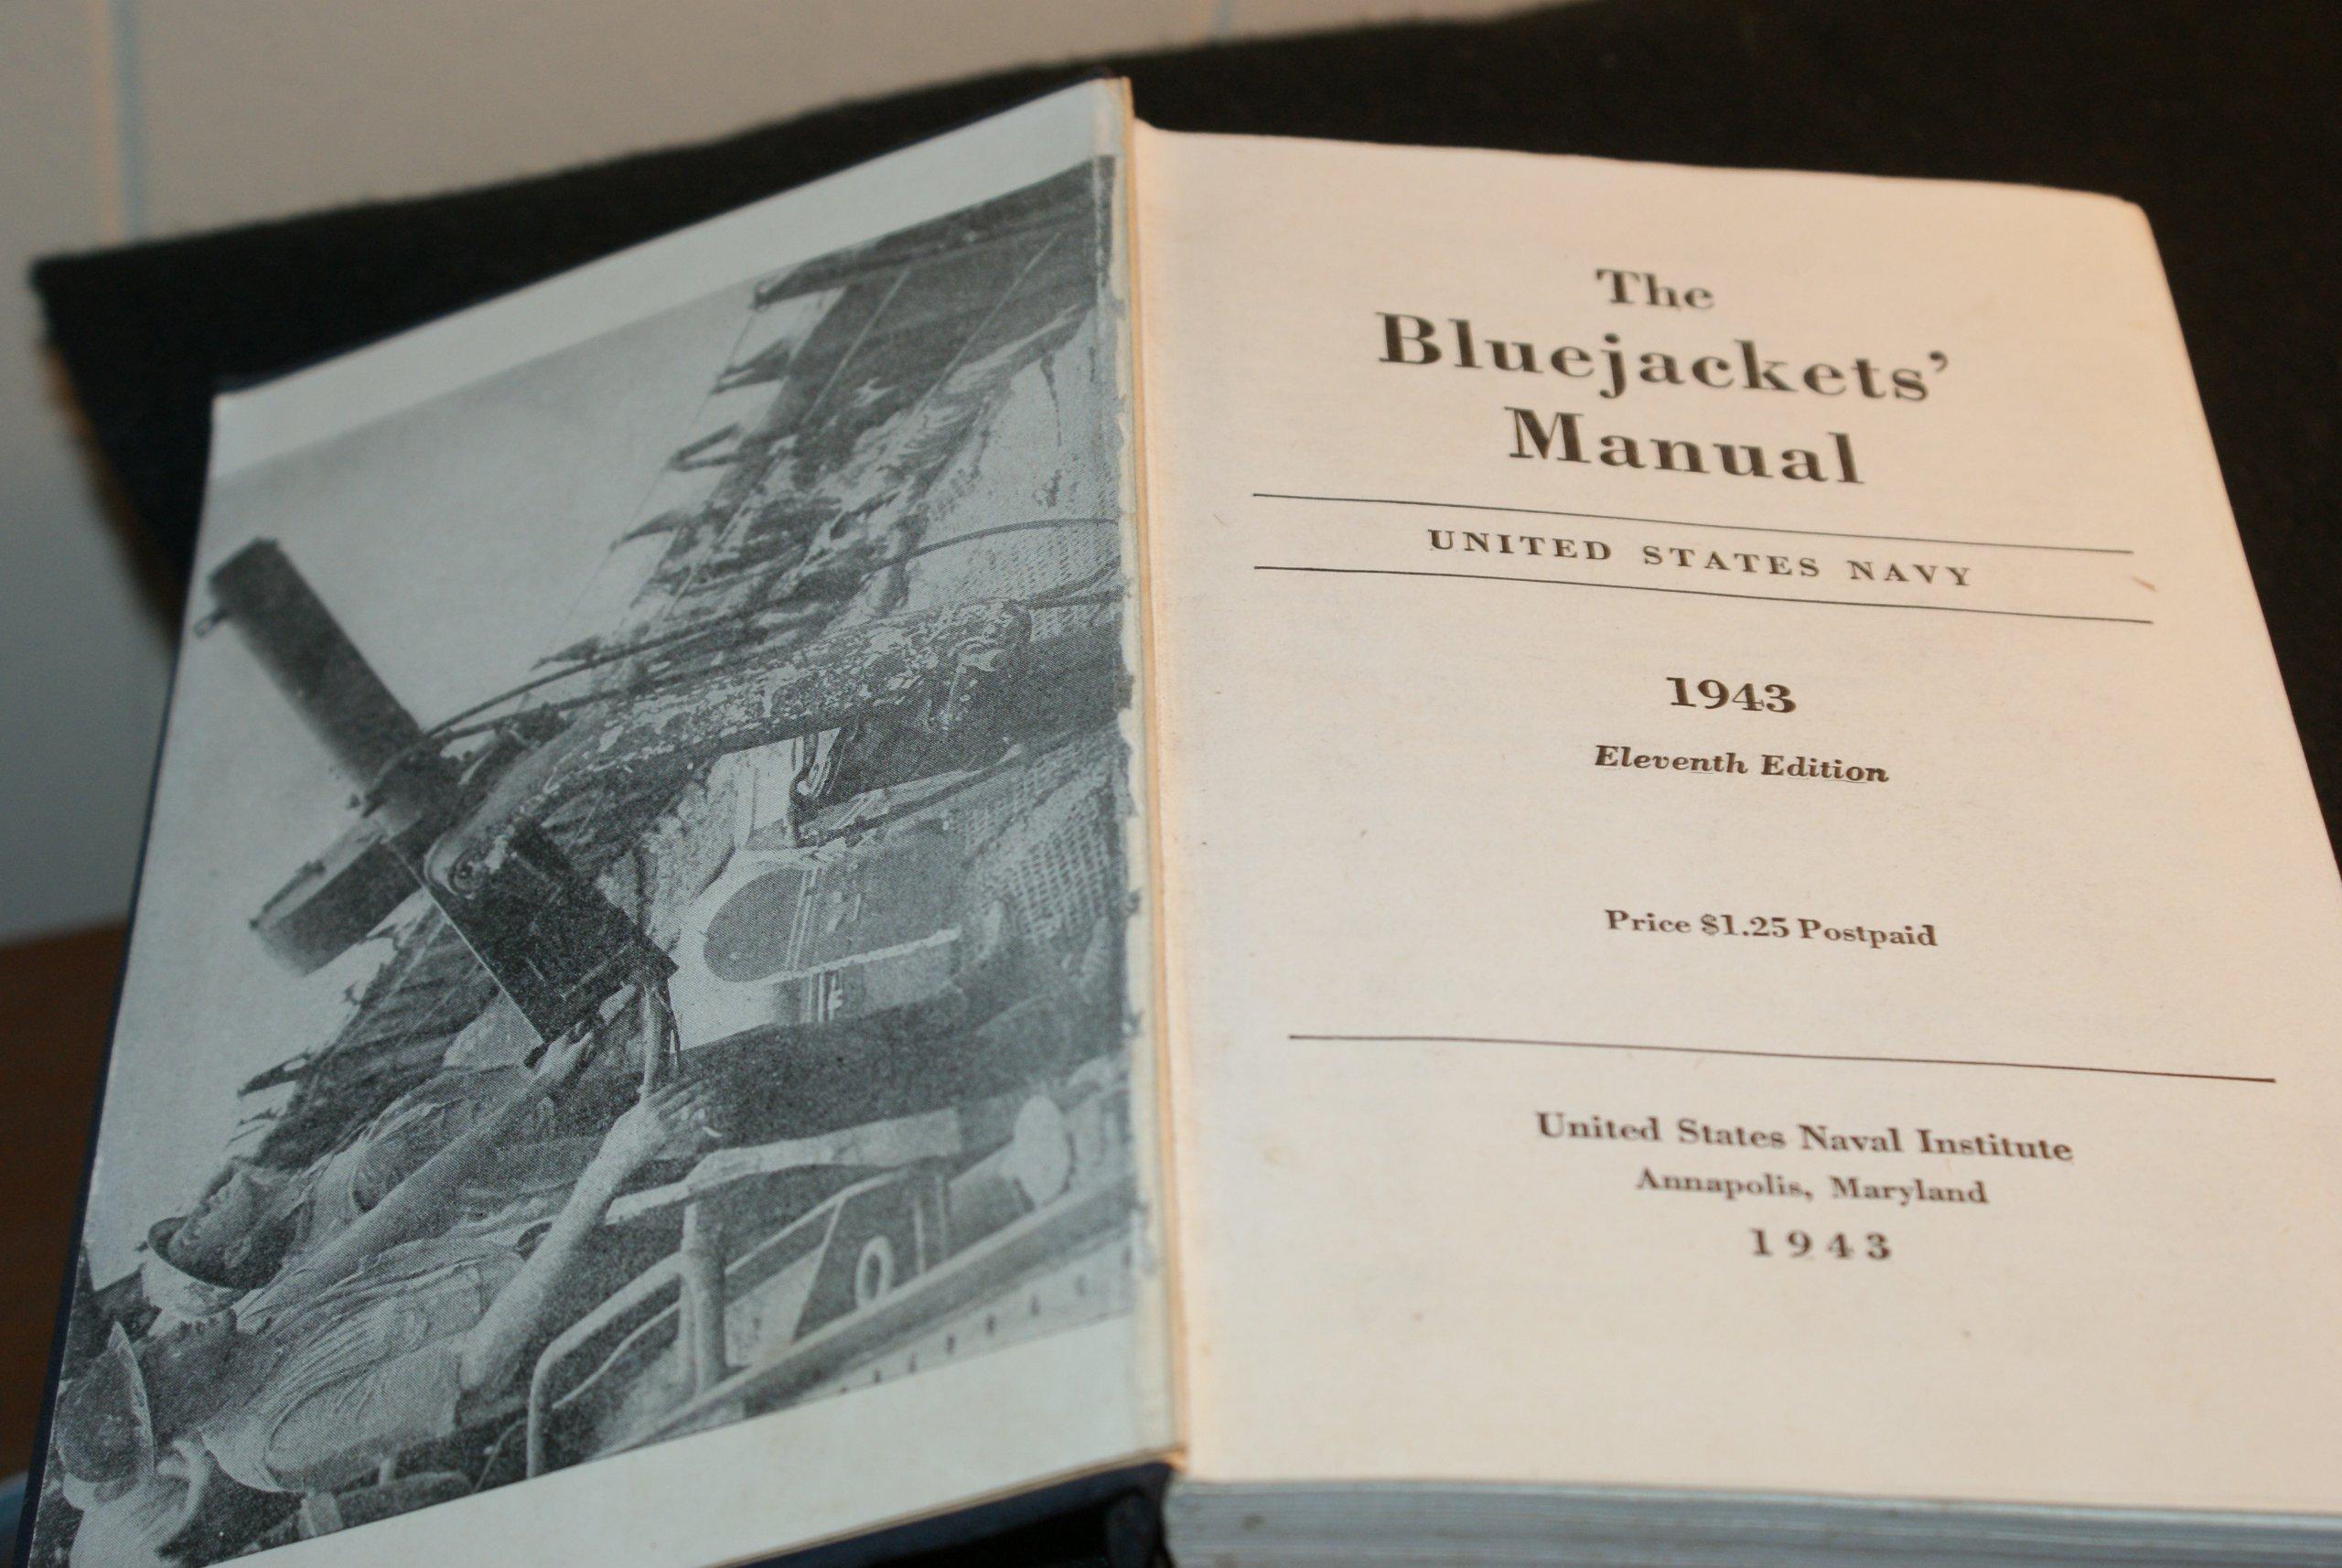 Bluejackets Manual 1943 11TH Edition: United States Navy: Amazon.com: Books